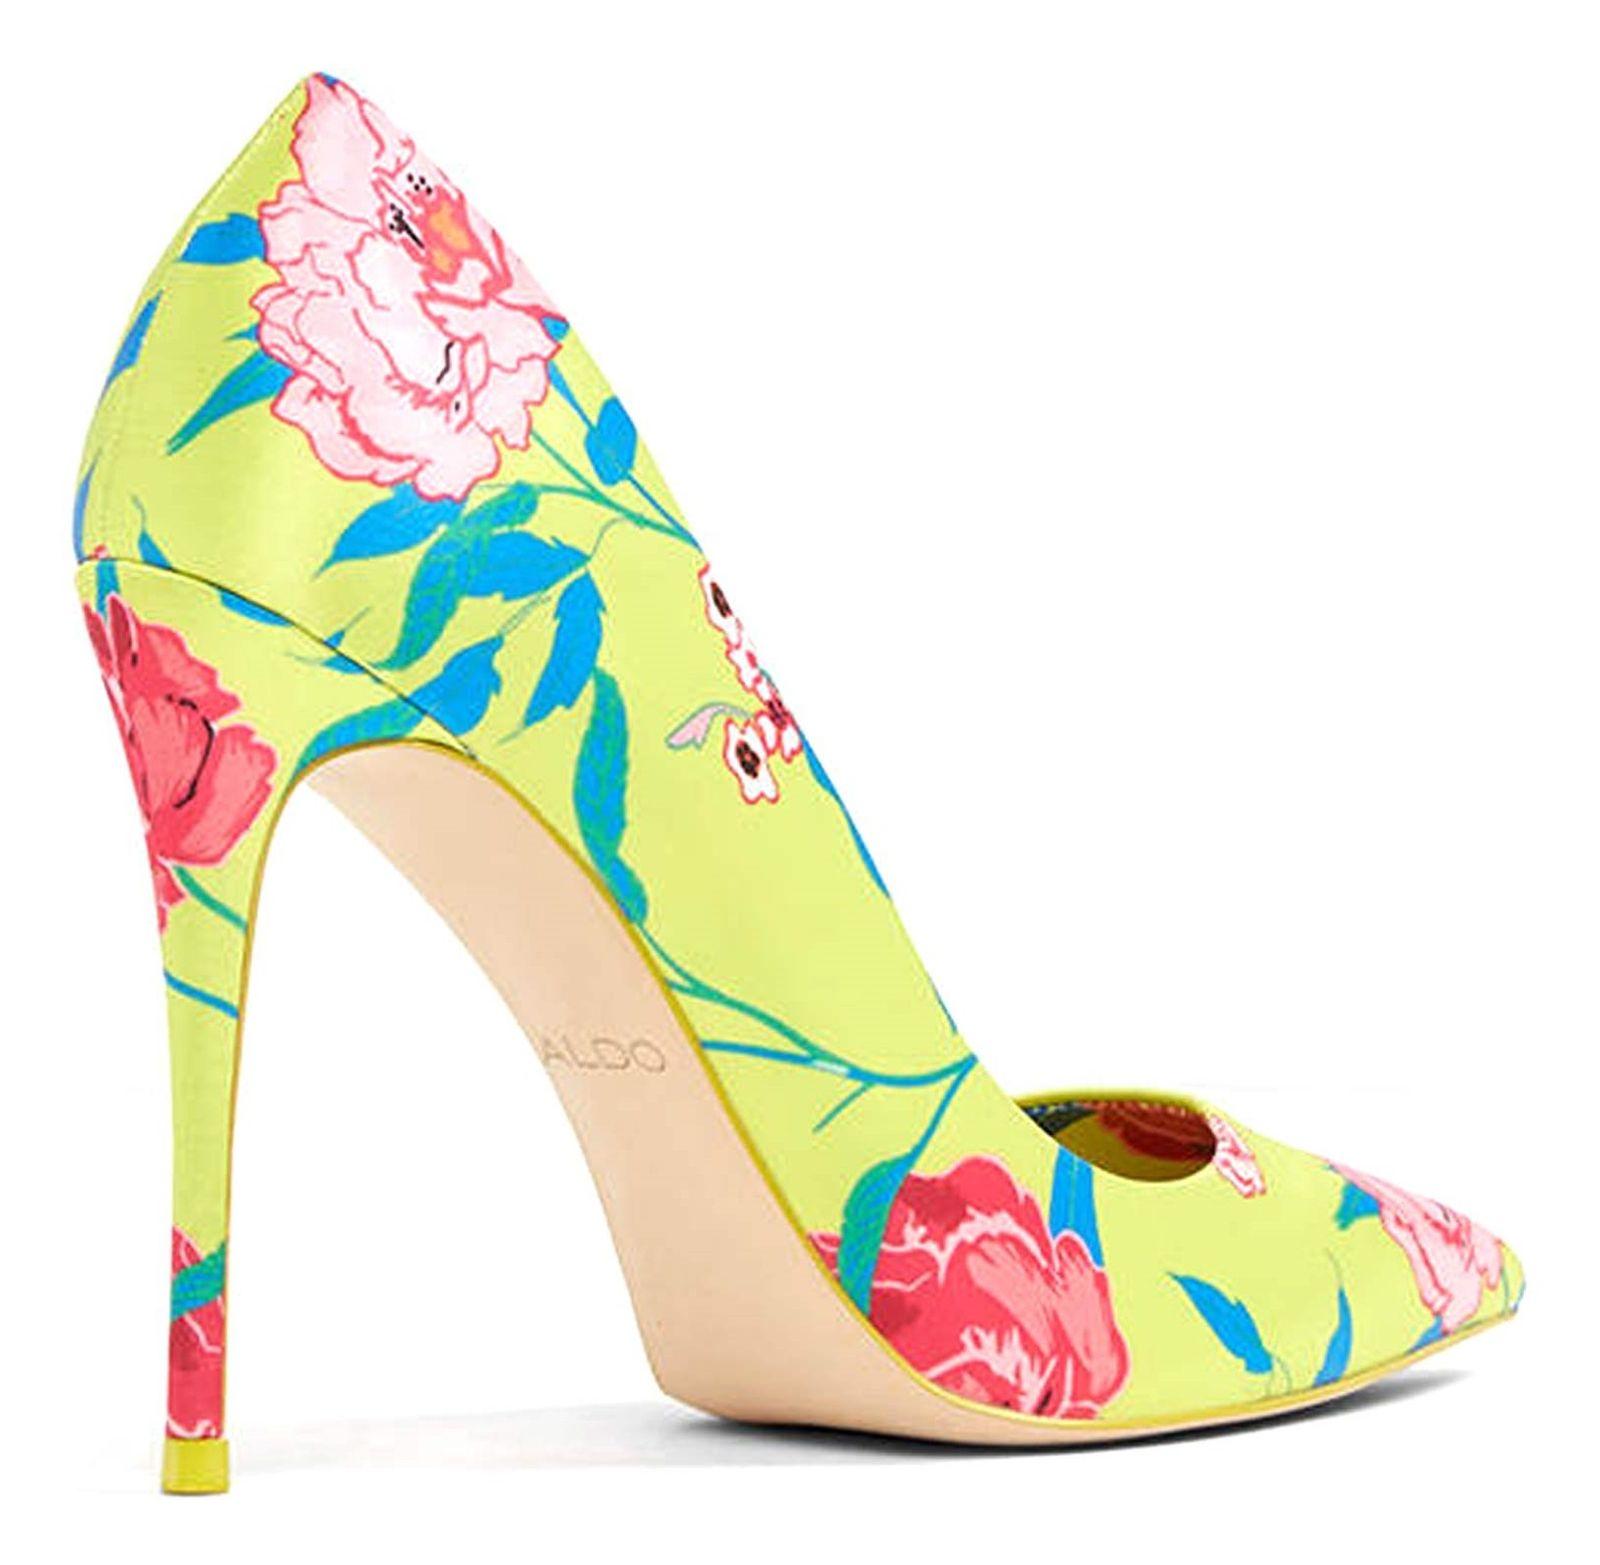 کفش پاشنه بلند زنانه - آلدو - سبز فسفري - 2